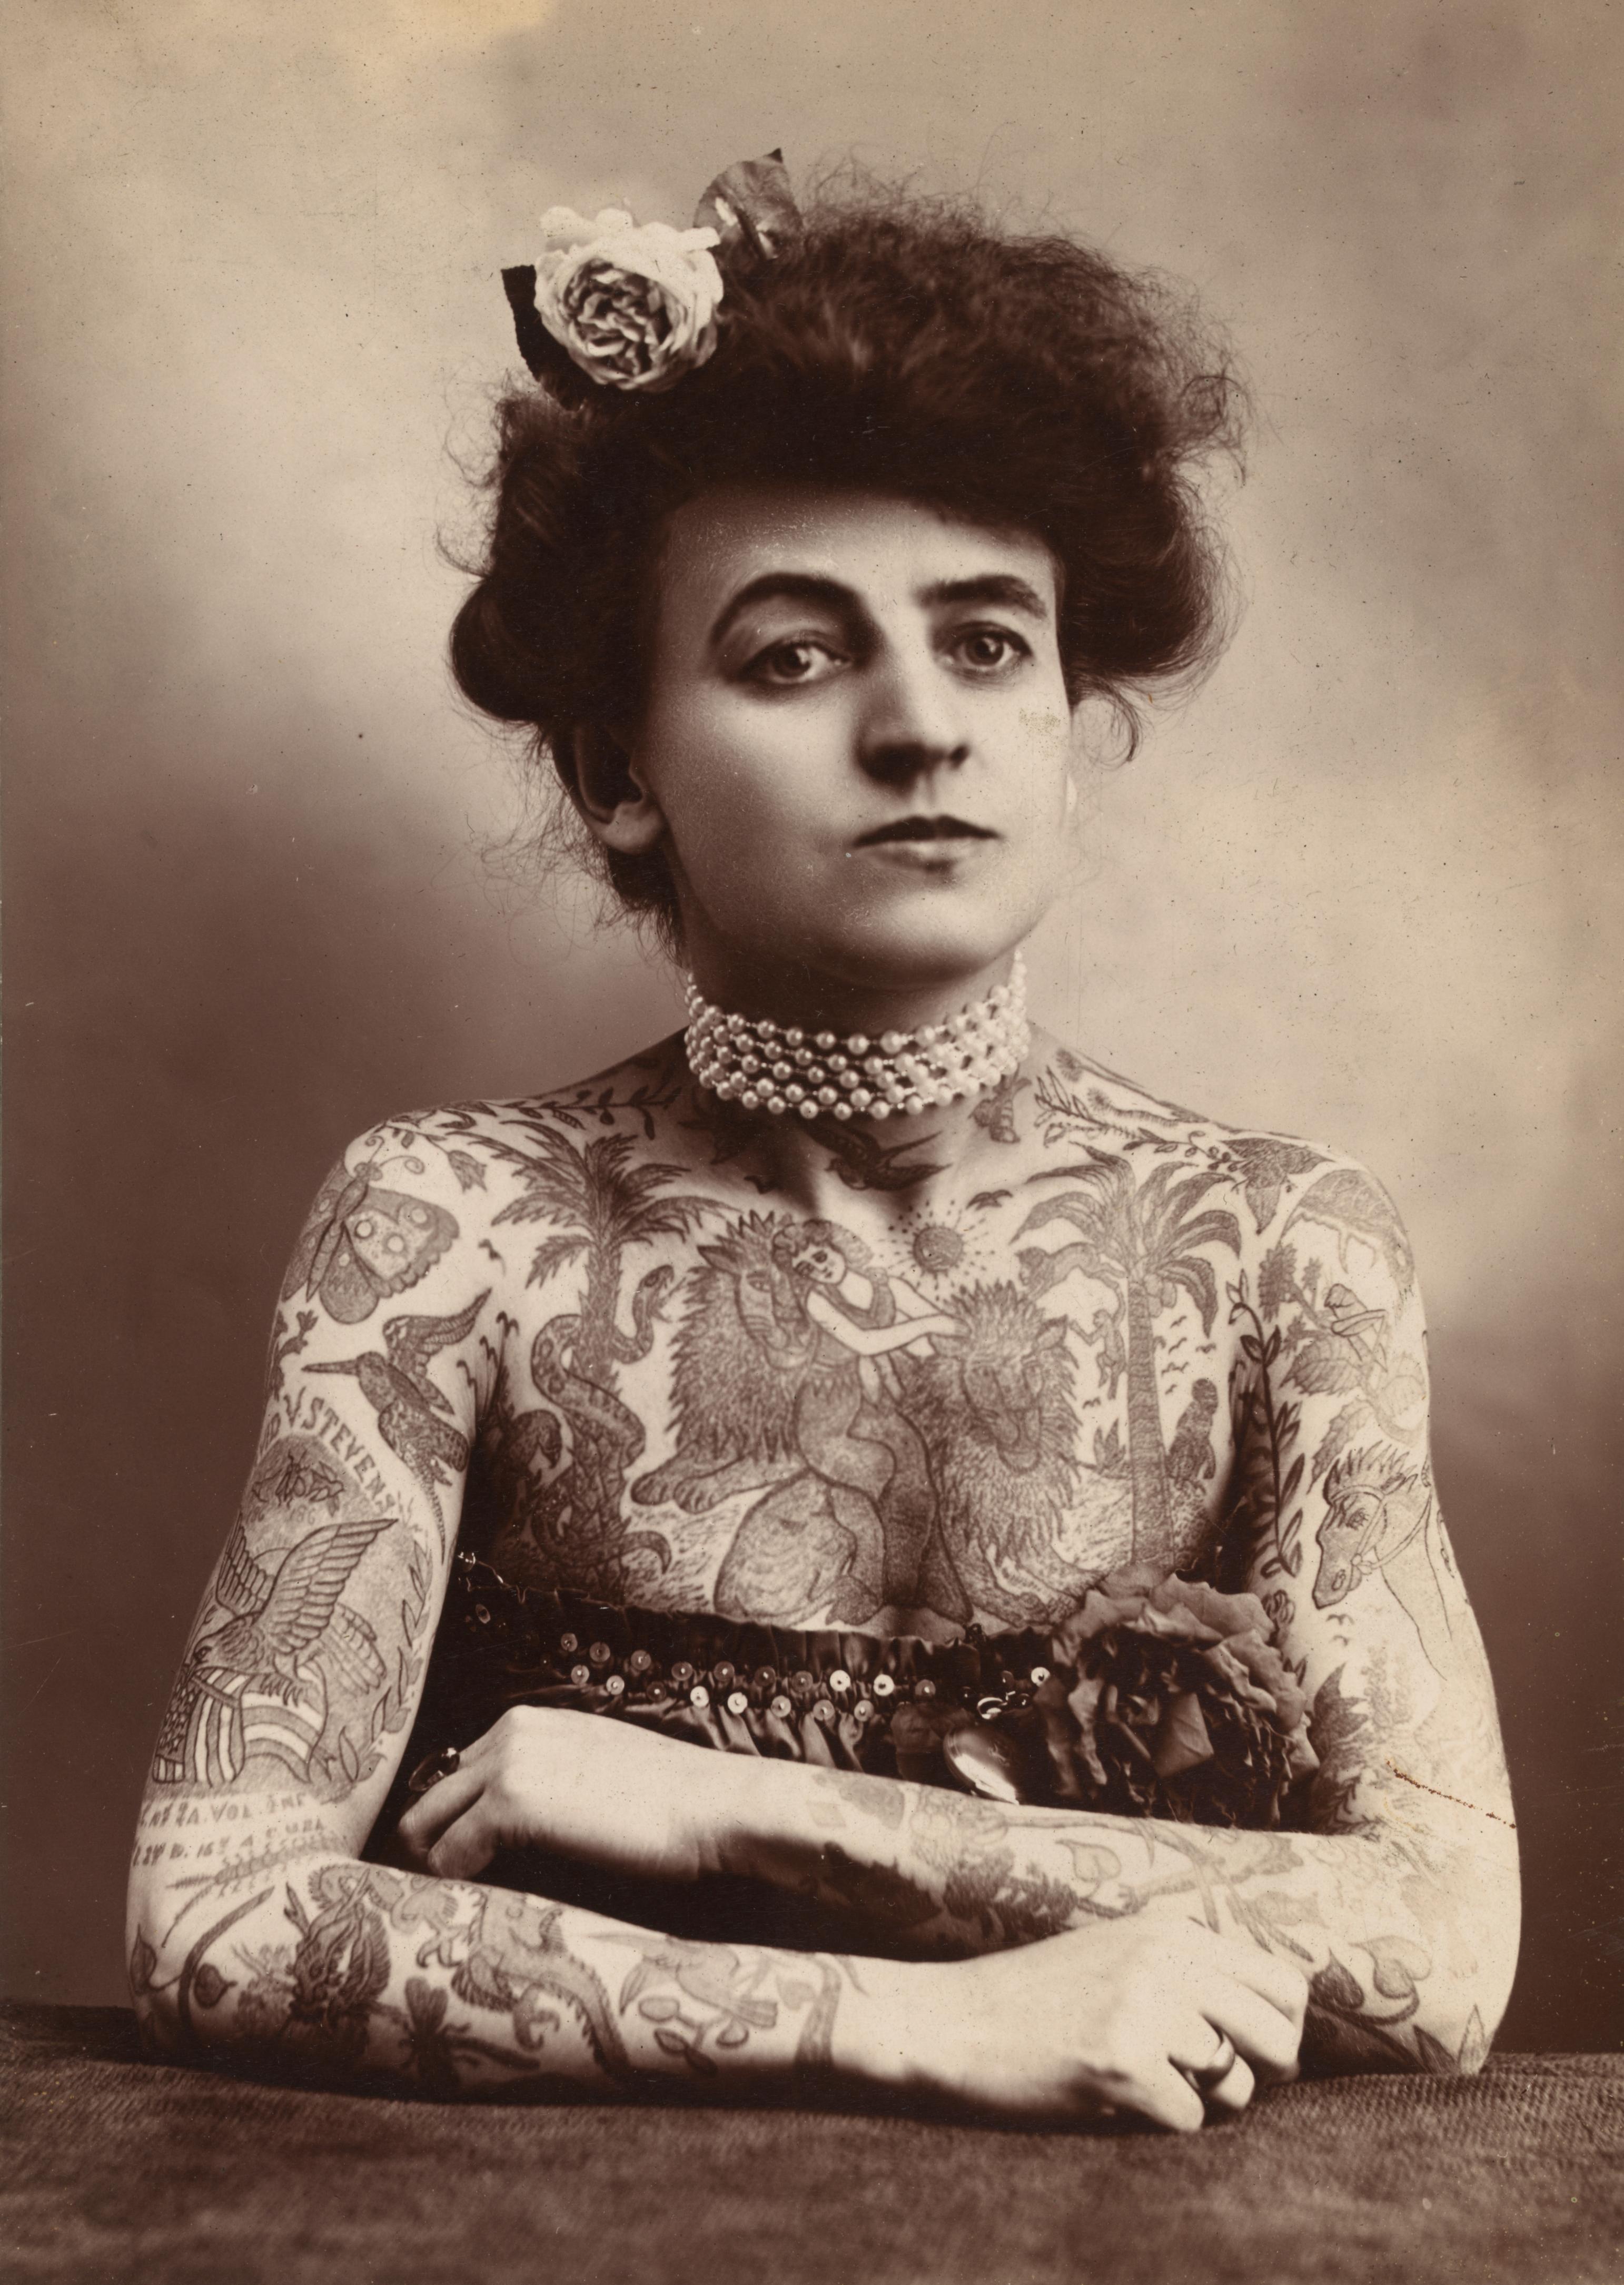 essays on tattoos and society